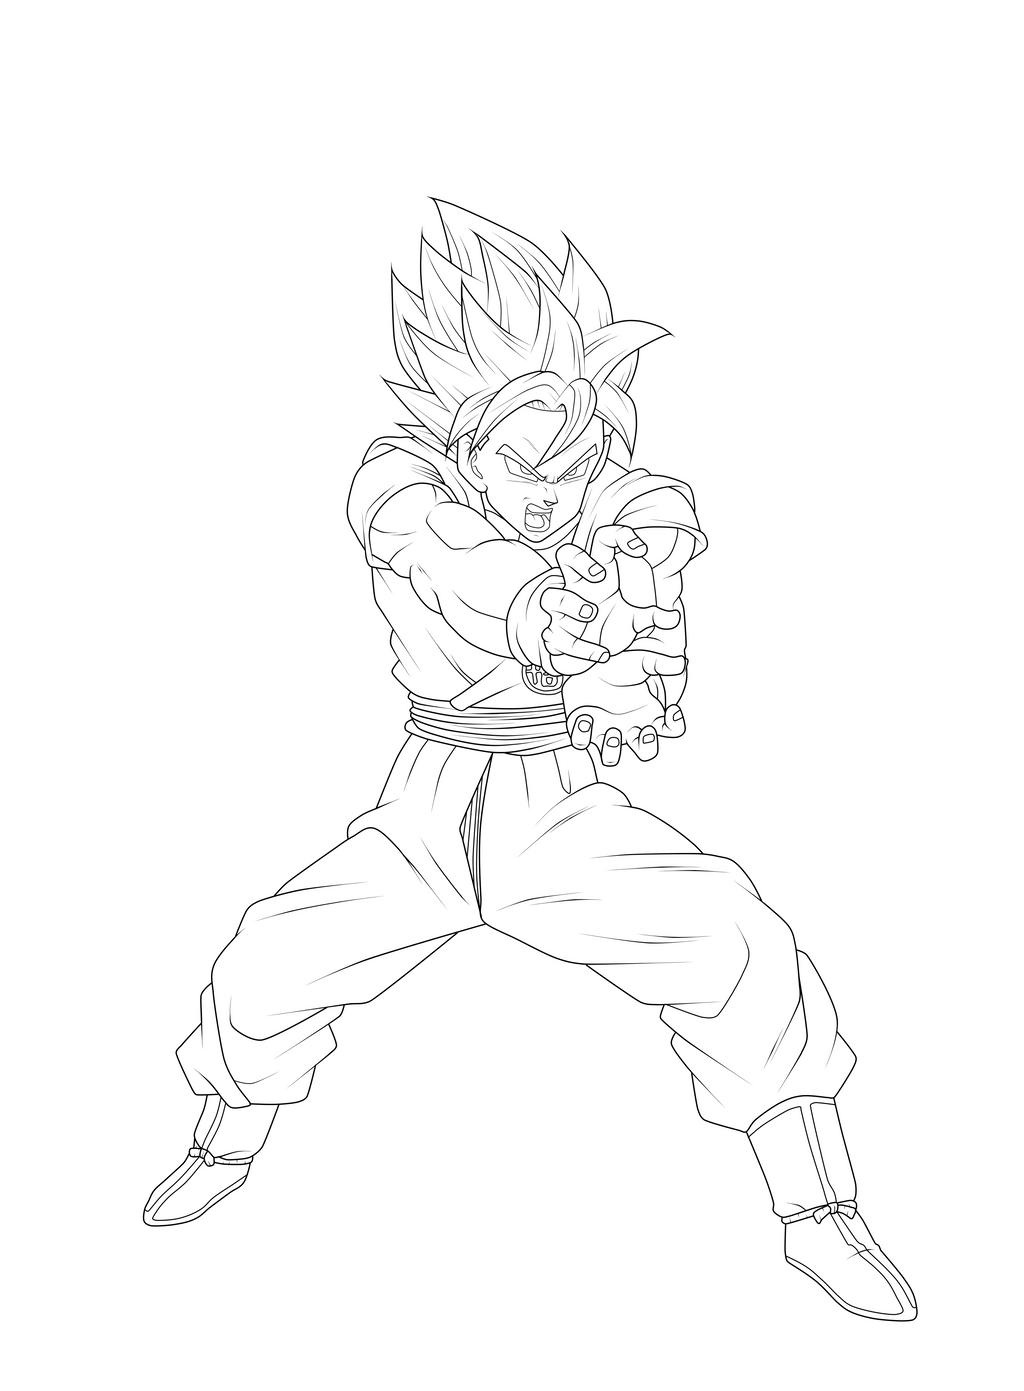 Goku Super Saiyan Blue Kaioken Lineart by ChronoFz on ...